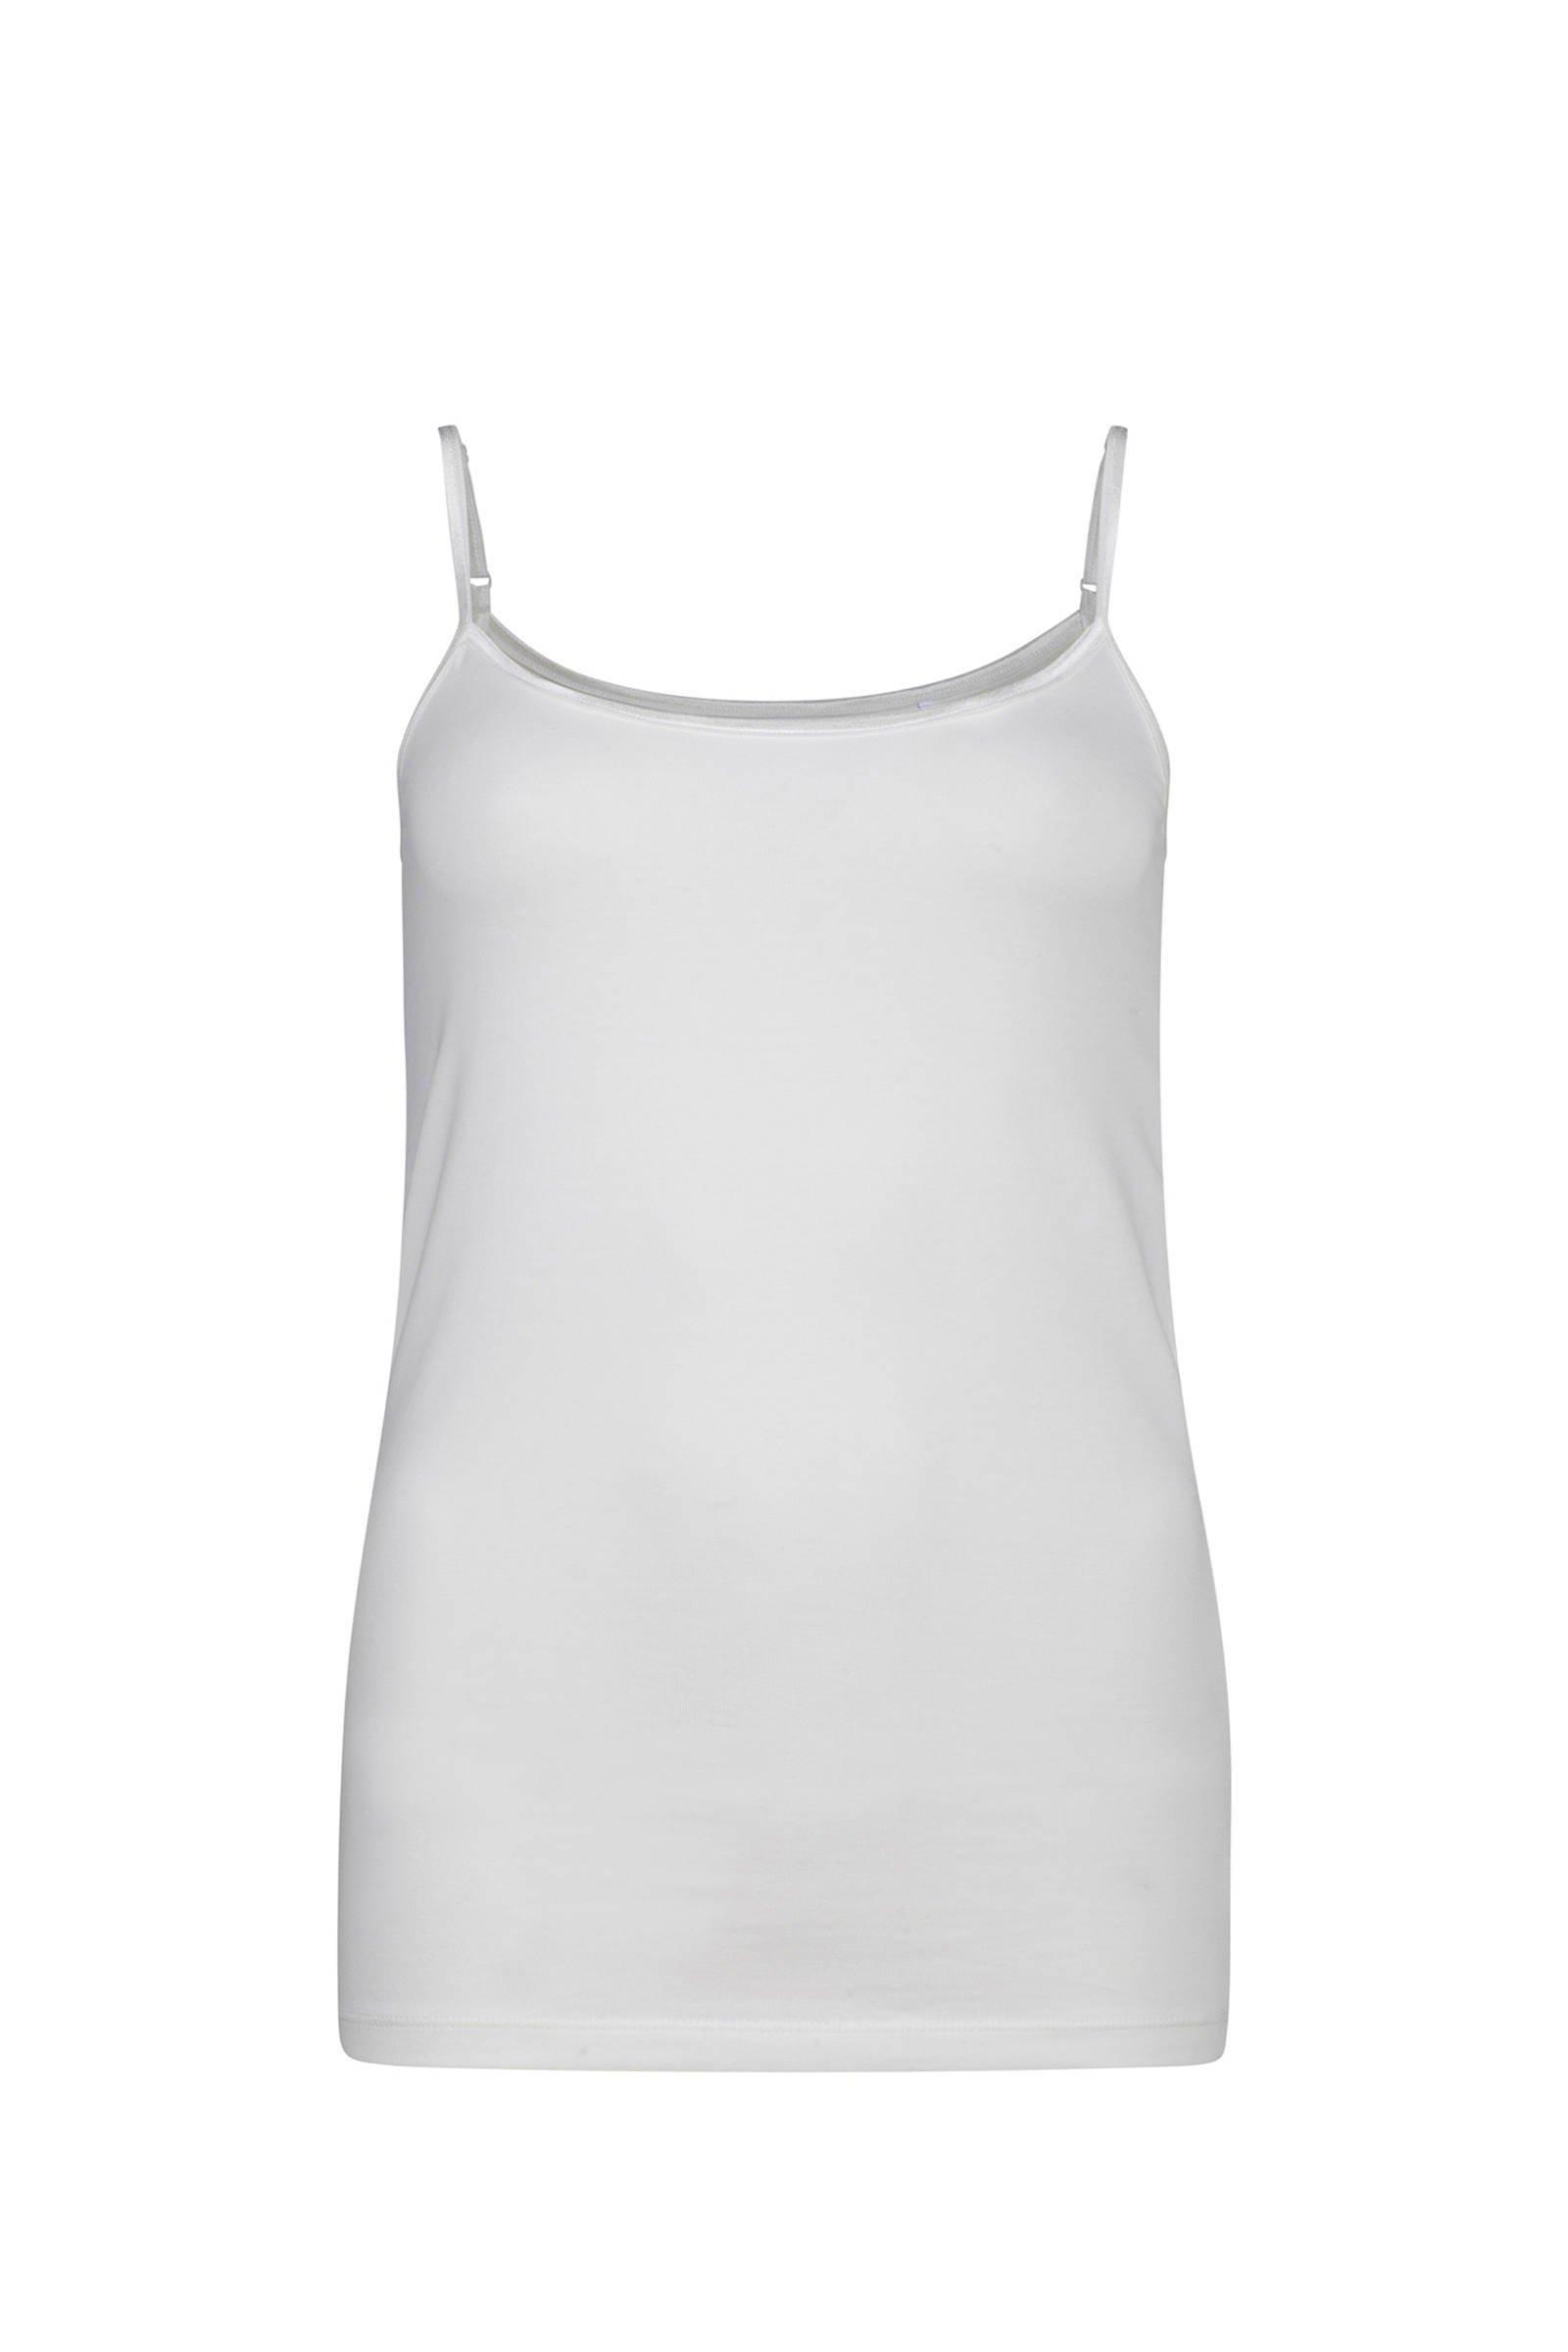 f6503cfcad5789 Best Basics WE Fashion bij wehkamp - Gratis bezorging vanaf 20.-